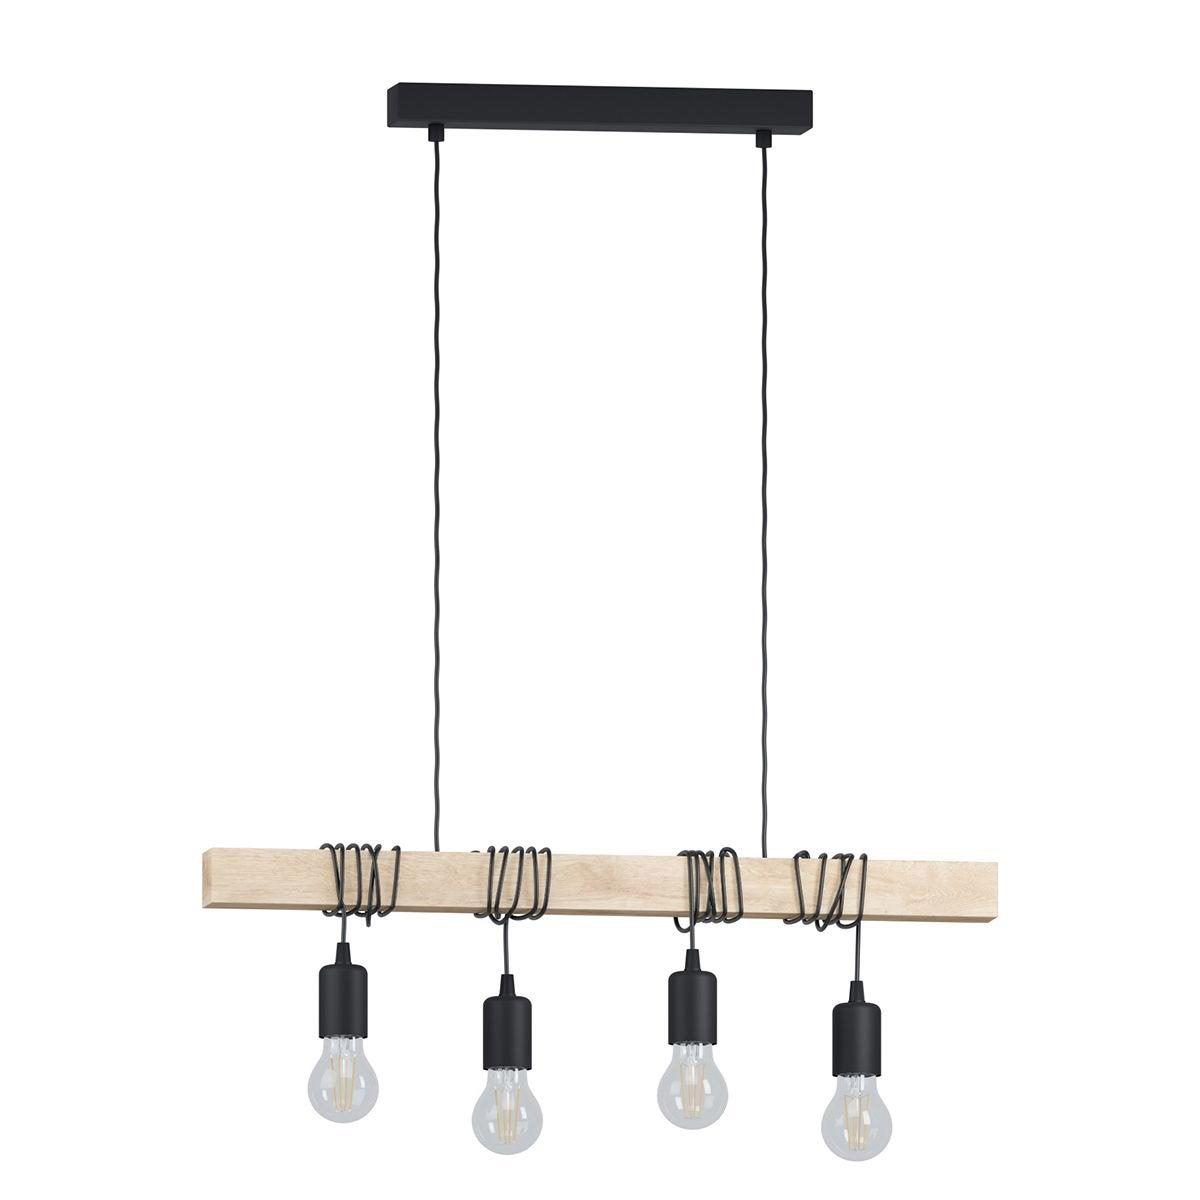 suspension e27 design townshend bois noir 4 x 60 w eglo leroy merlin. Black Bedroom Furniture Sets. Home Design Ideas